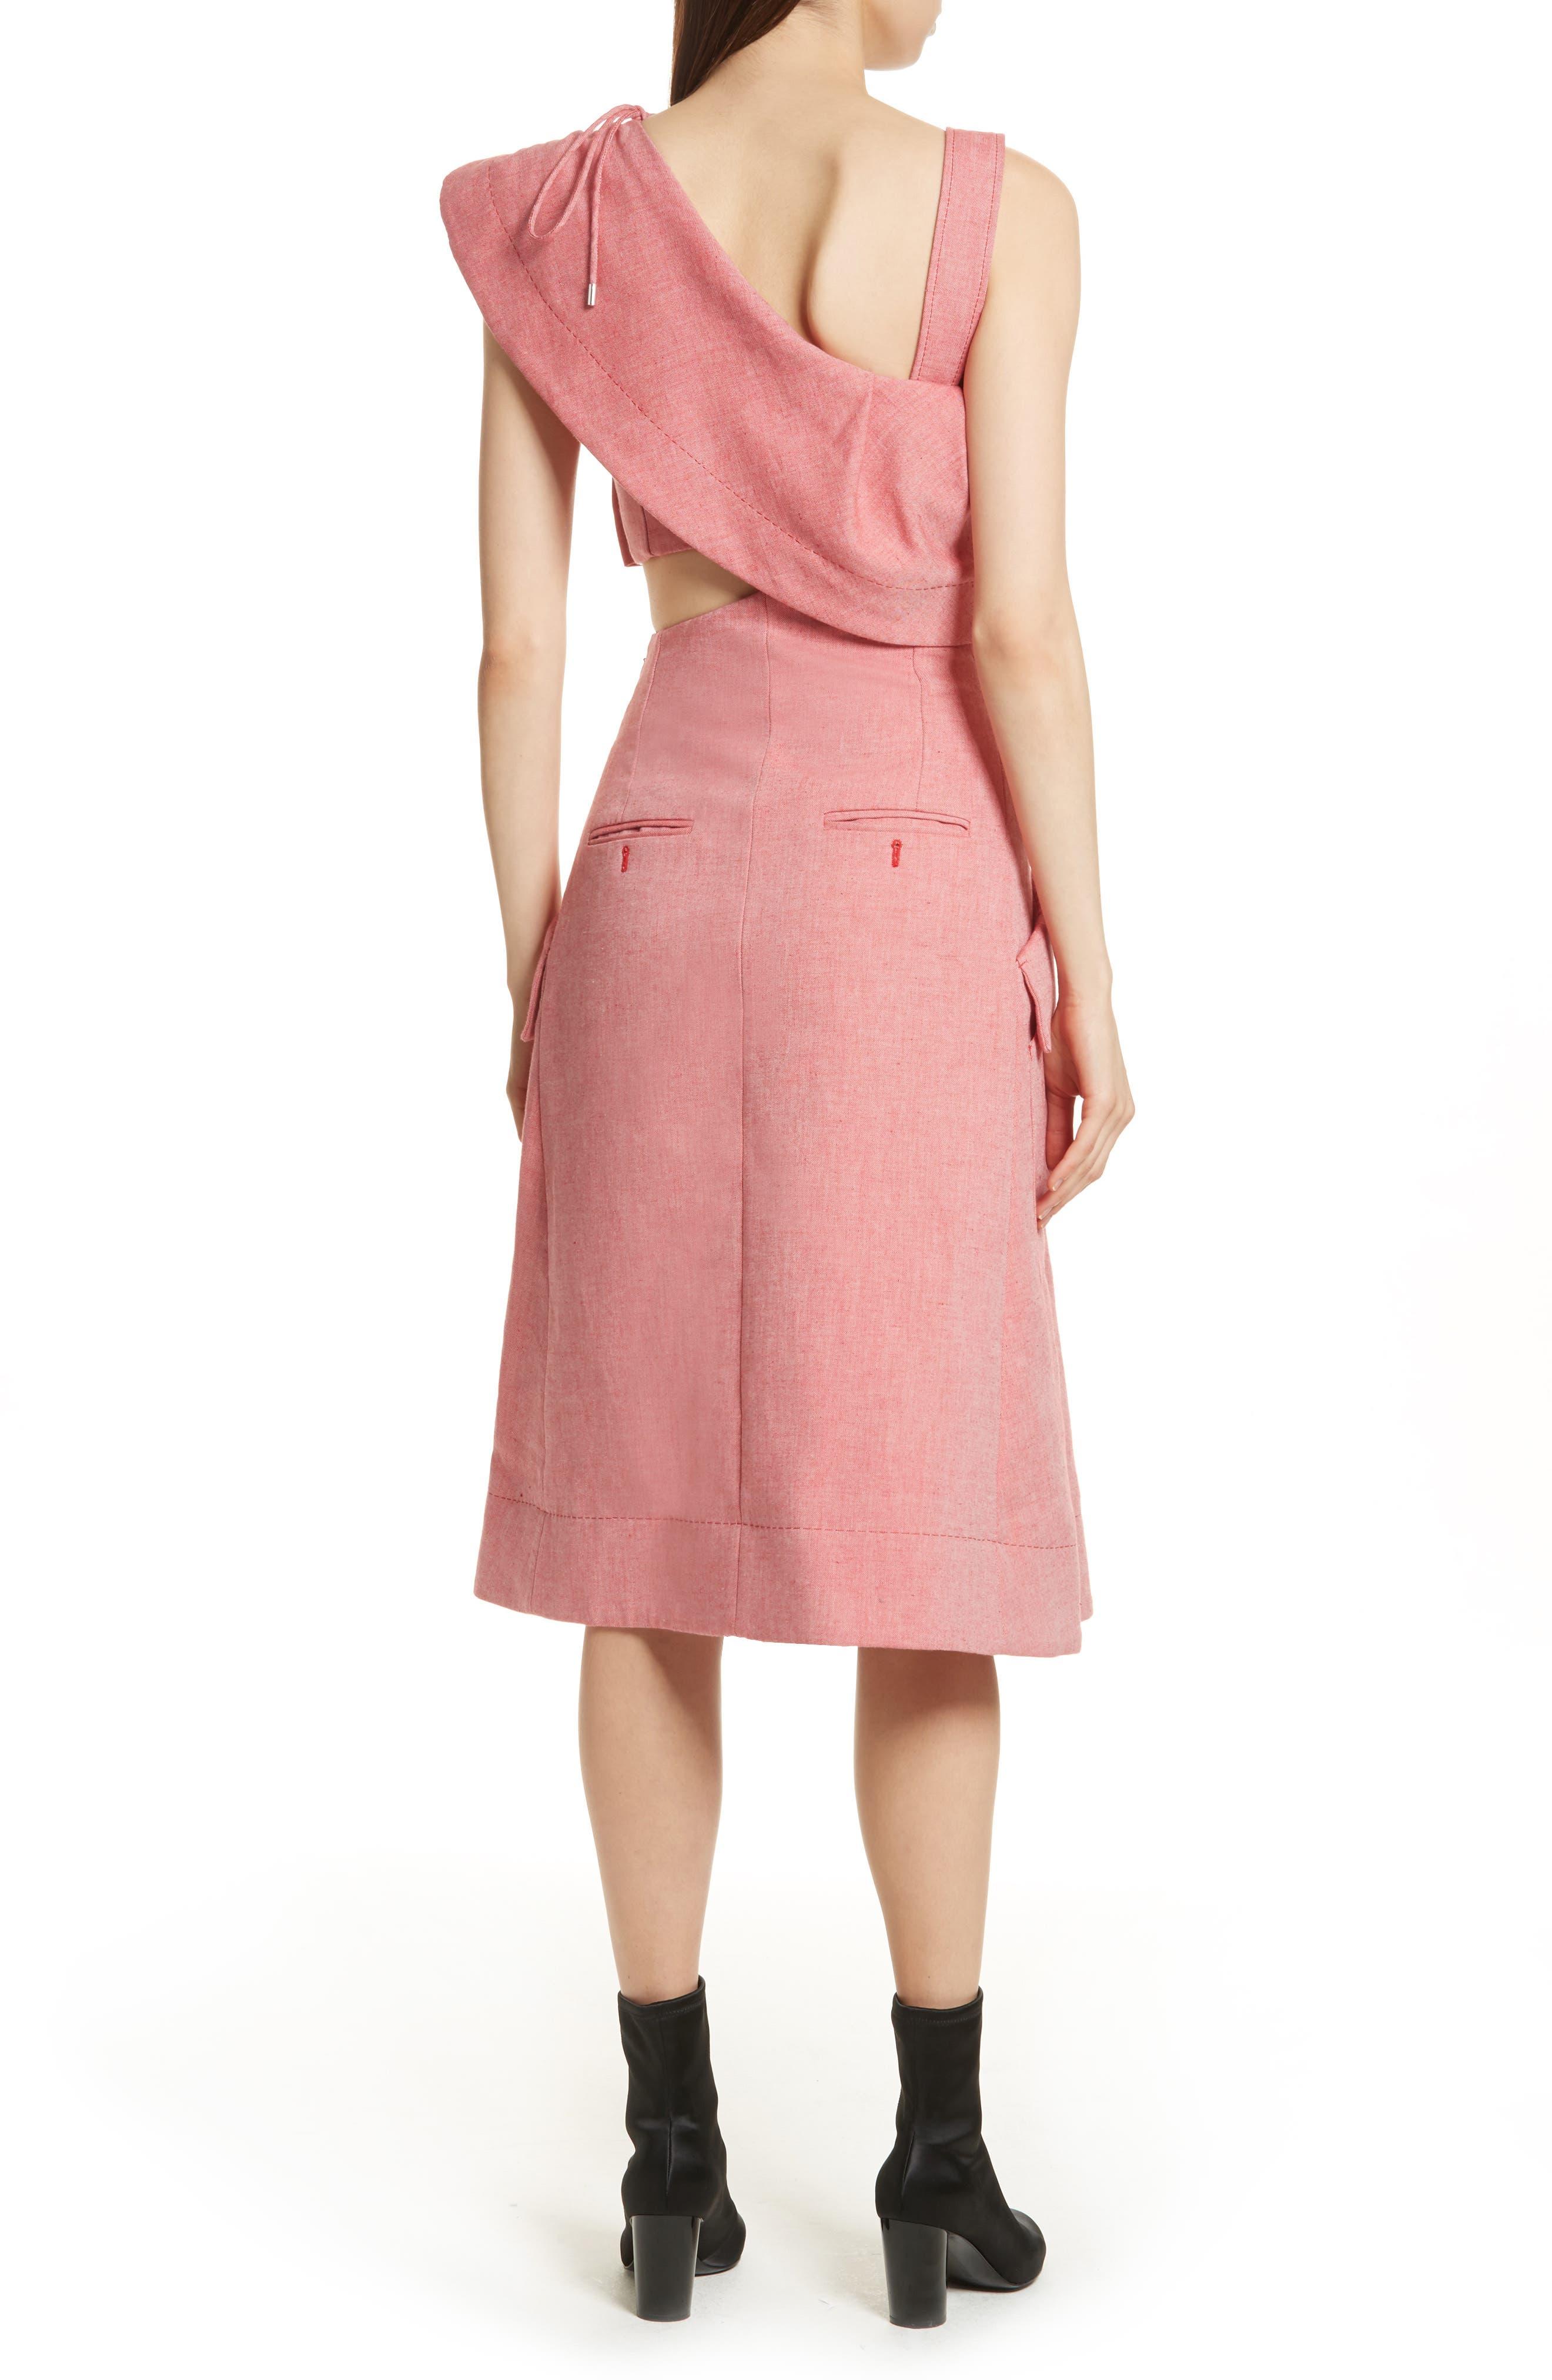 Robe Genou Dress,                             Alternate thumbnail 2, color,                             650